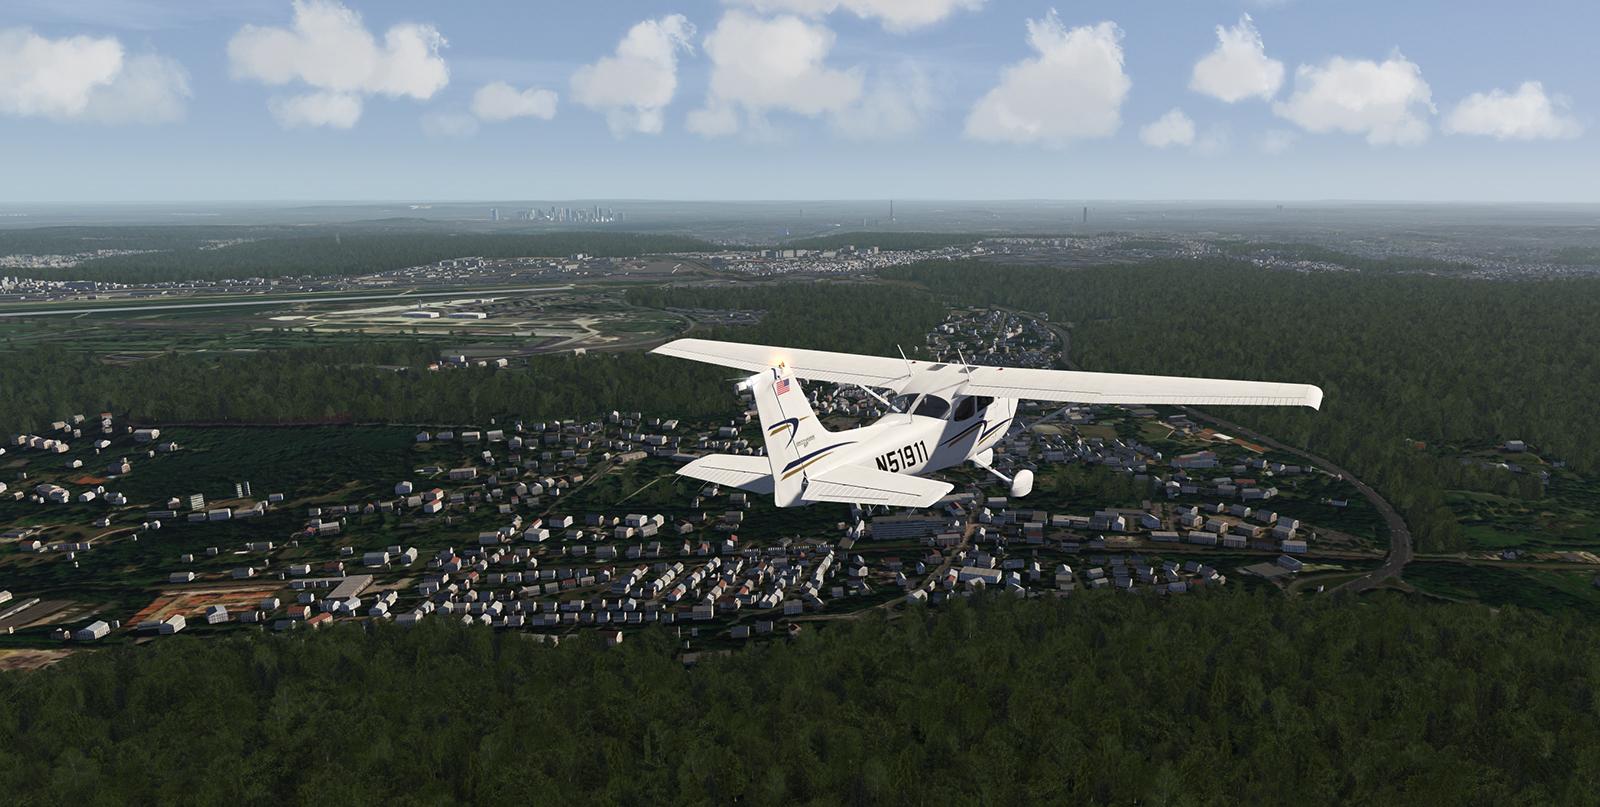 aerofly_fs_2_screenshot_10_20190919-2347